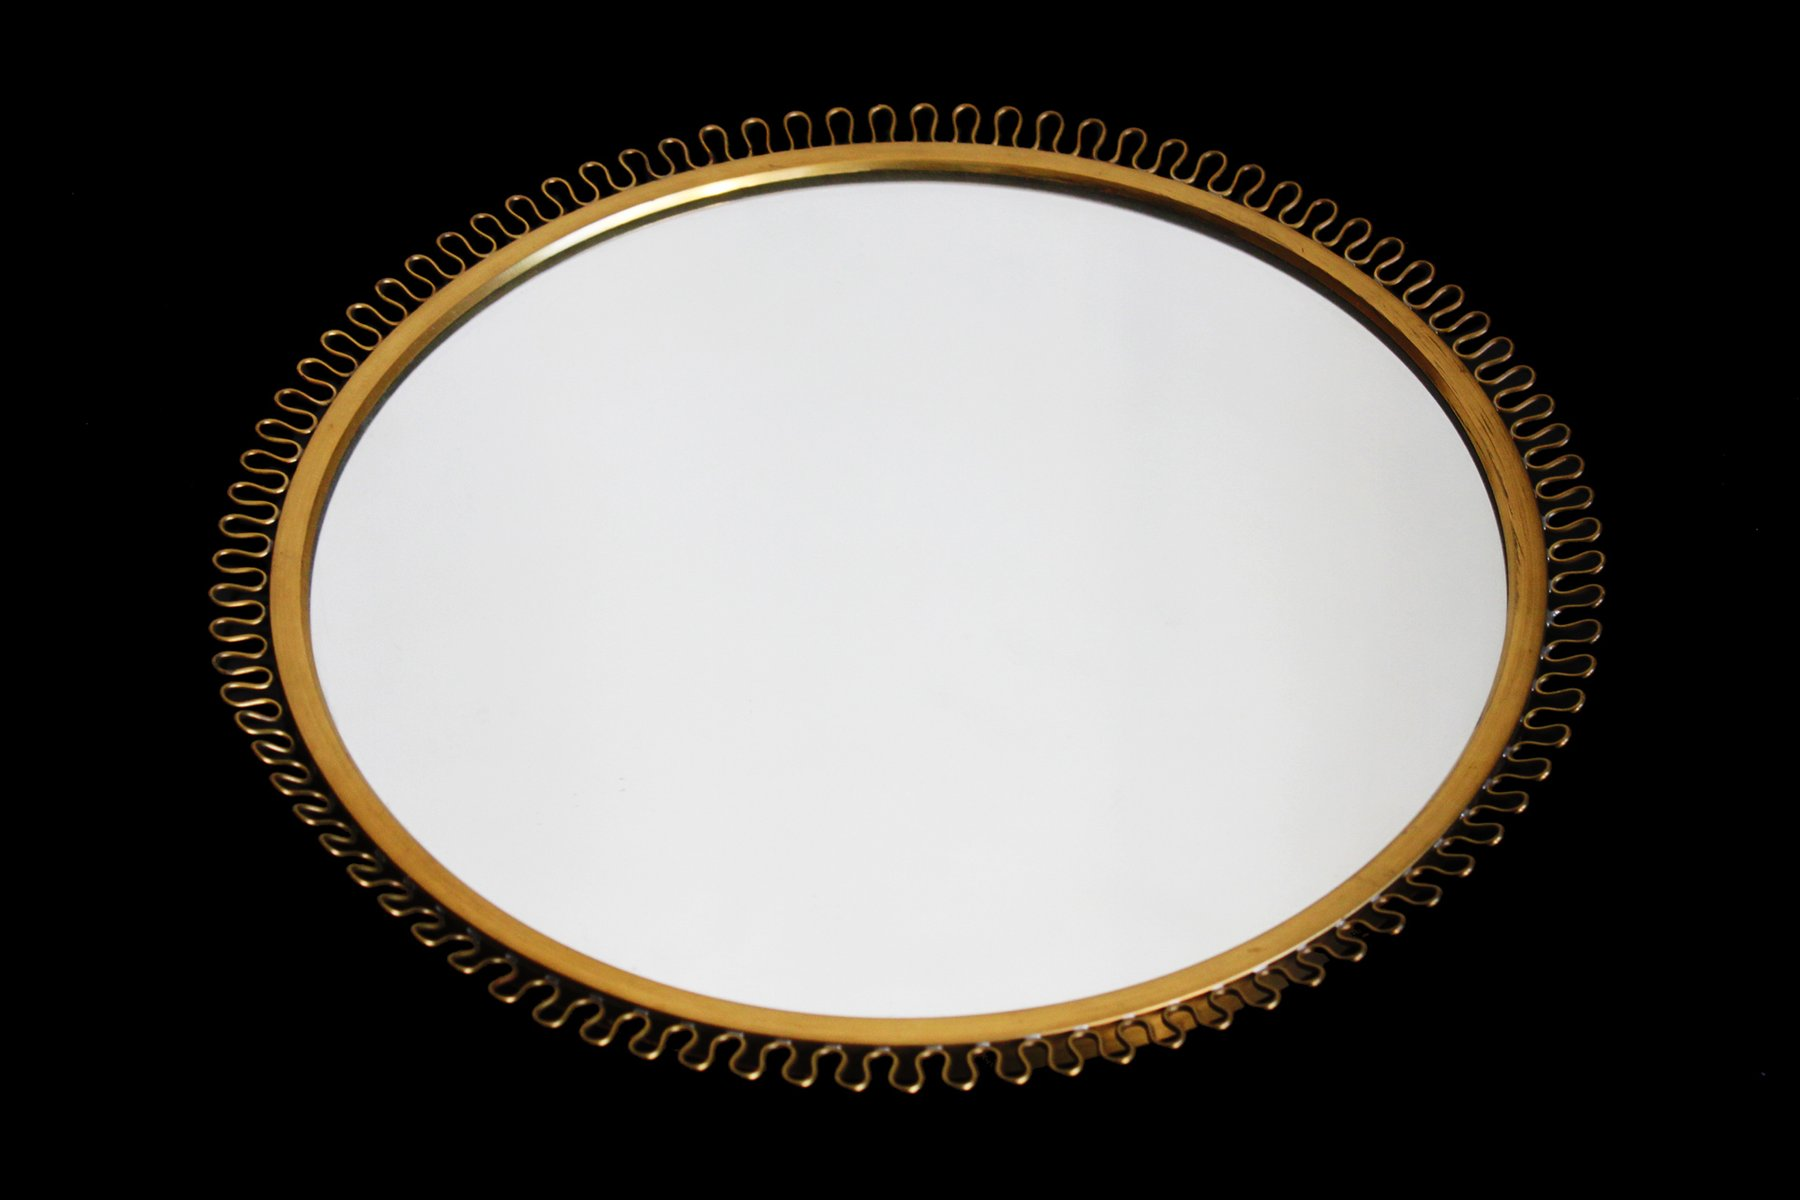 Miroir corona en laiton par josef frank en vente sur pamono for Miroir laiton